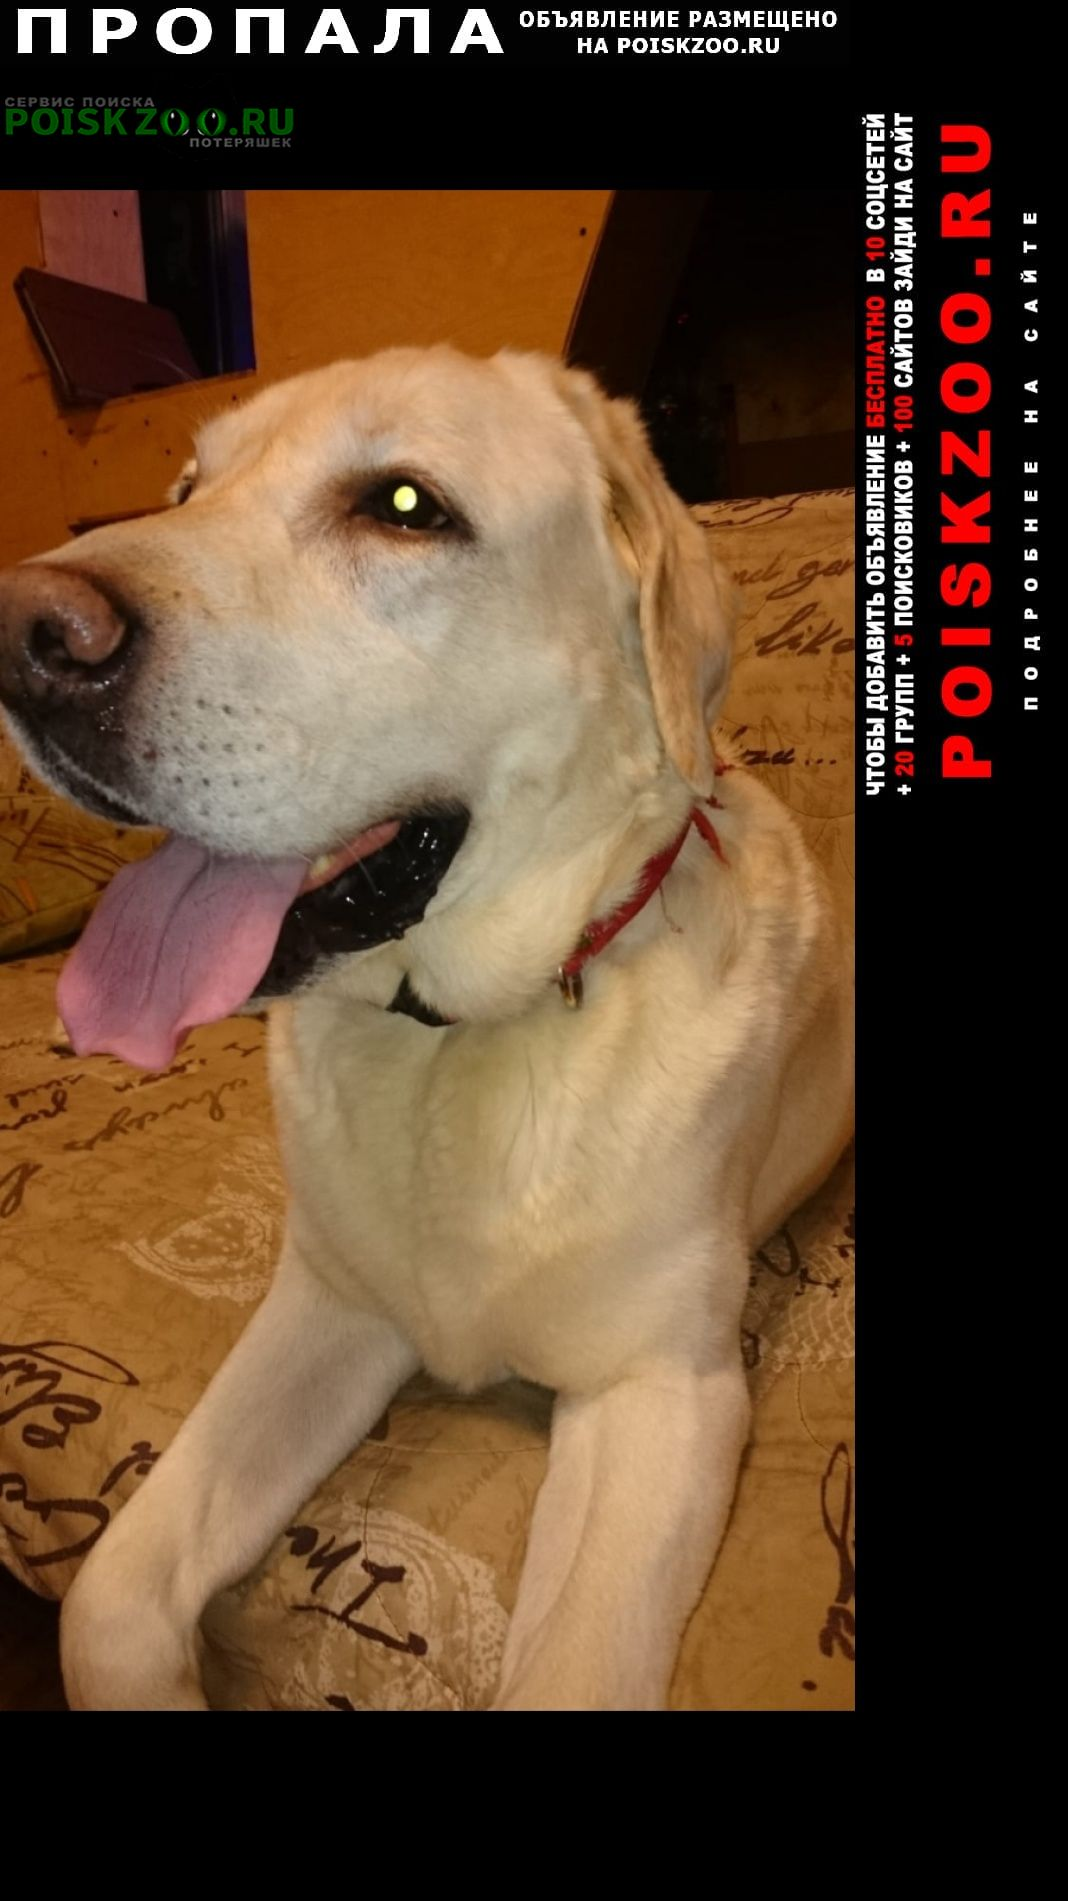 Пропала собака кобель Великий Новгород (Новгород)